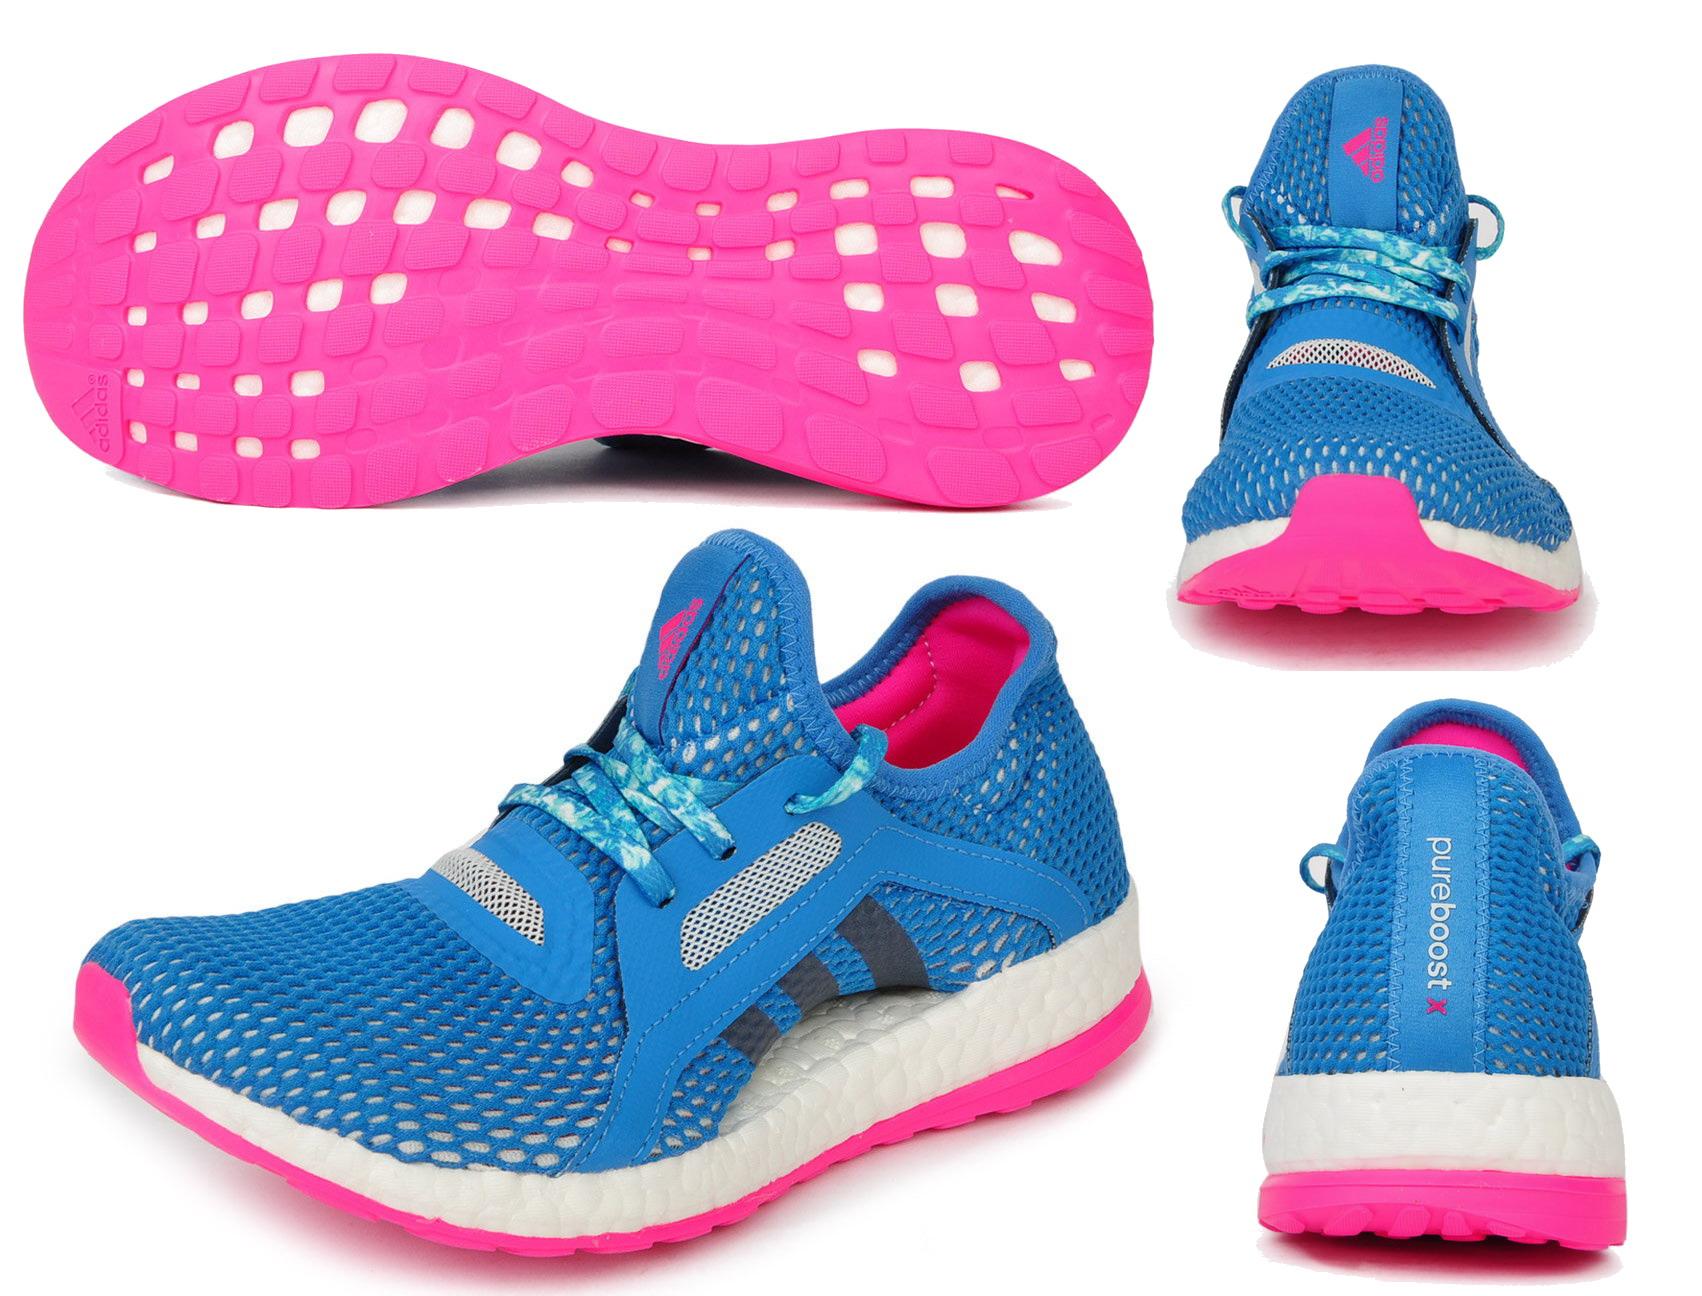 becb8f44 Adidas PureBoost X ClimaChill buty damskie - 36 - 7415092089 ...